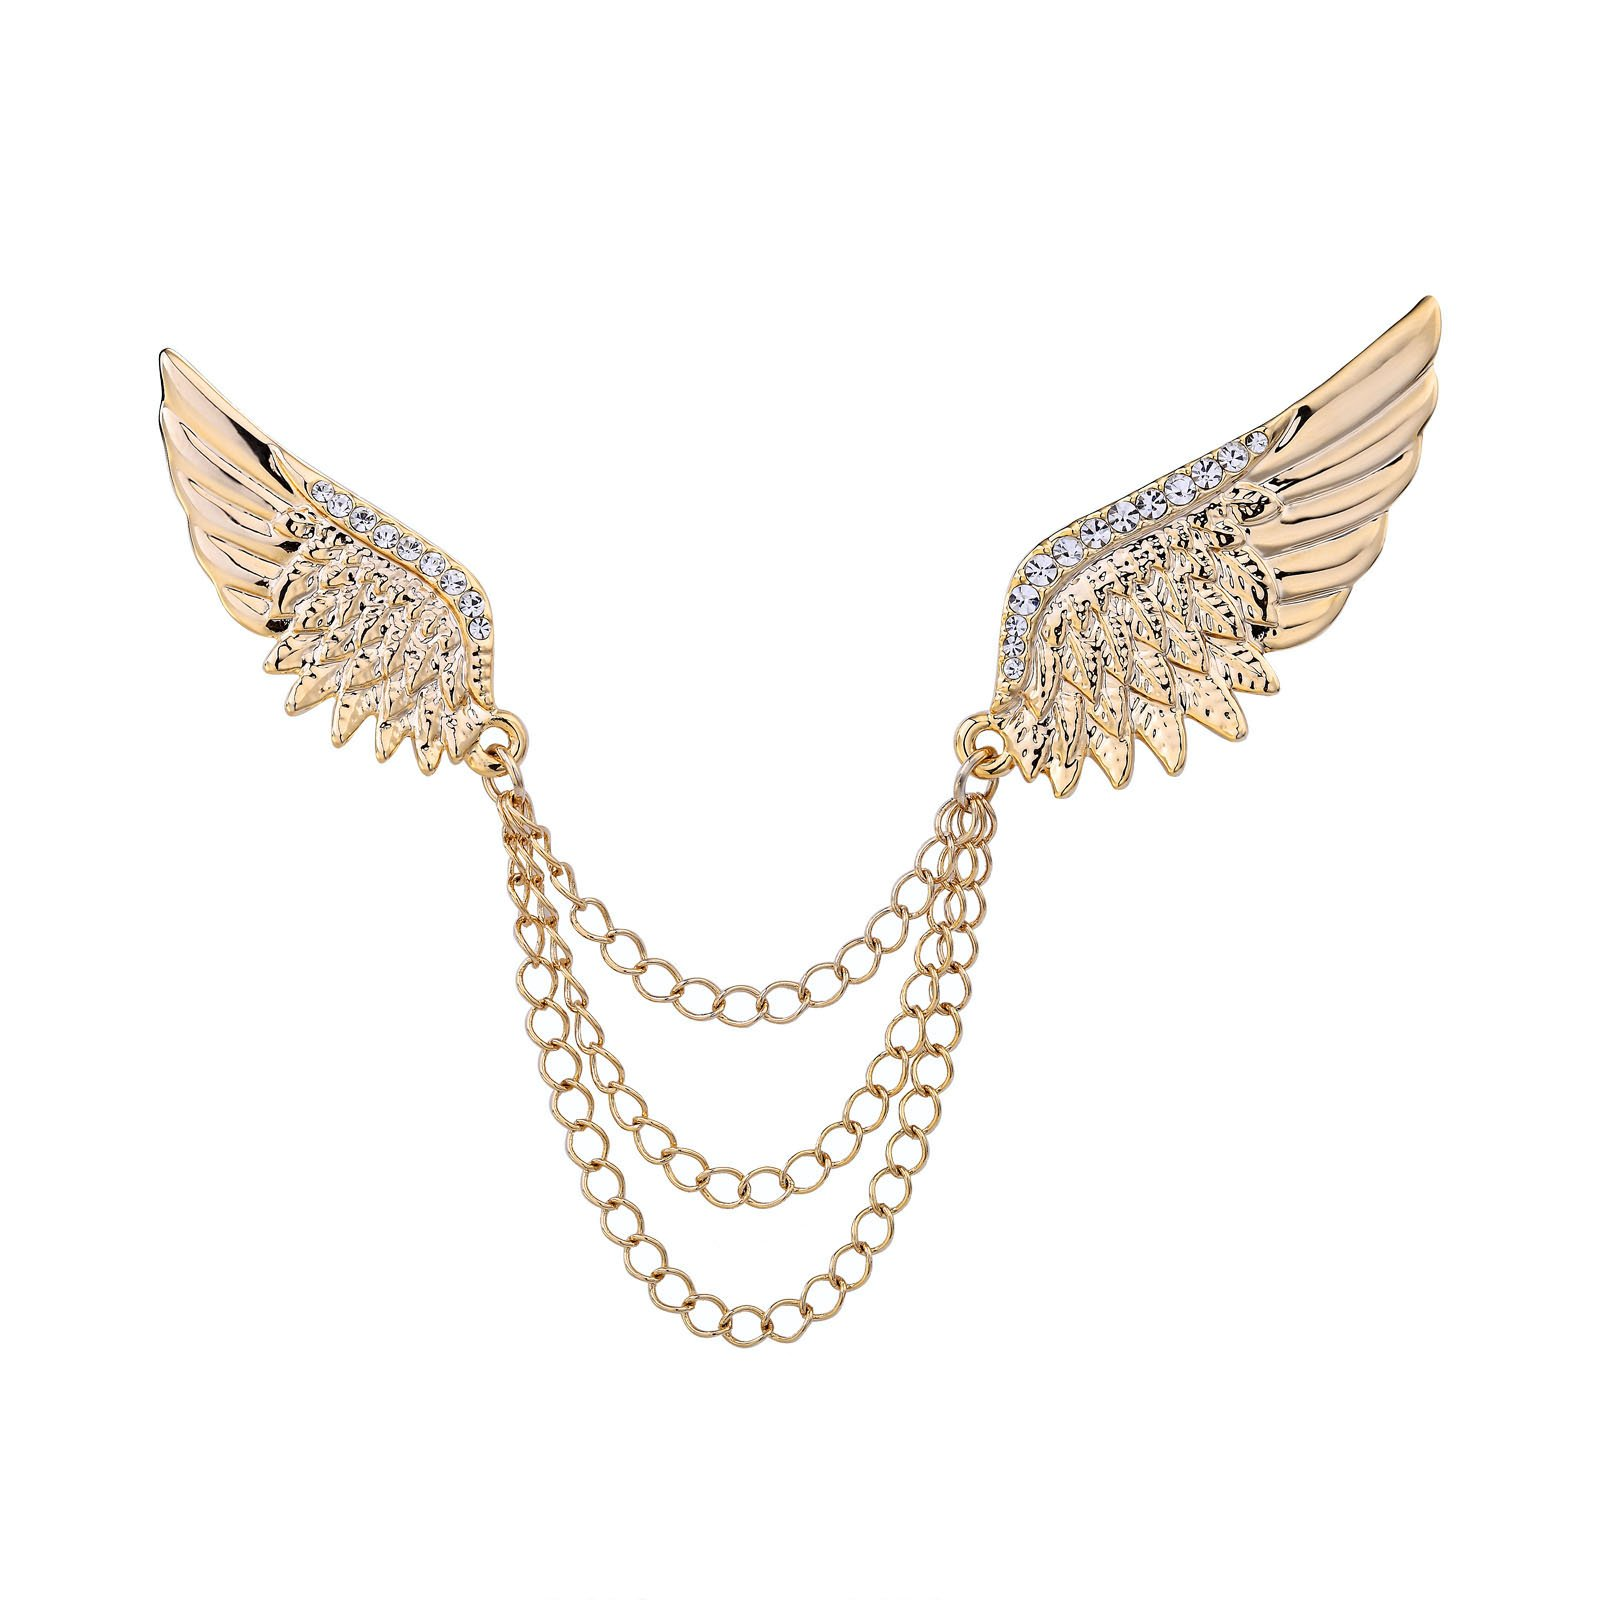 OKAJEWELRY Gold Tone Angel Wings Blouse Shirt Collar Tips Collar Brooch Pin